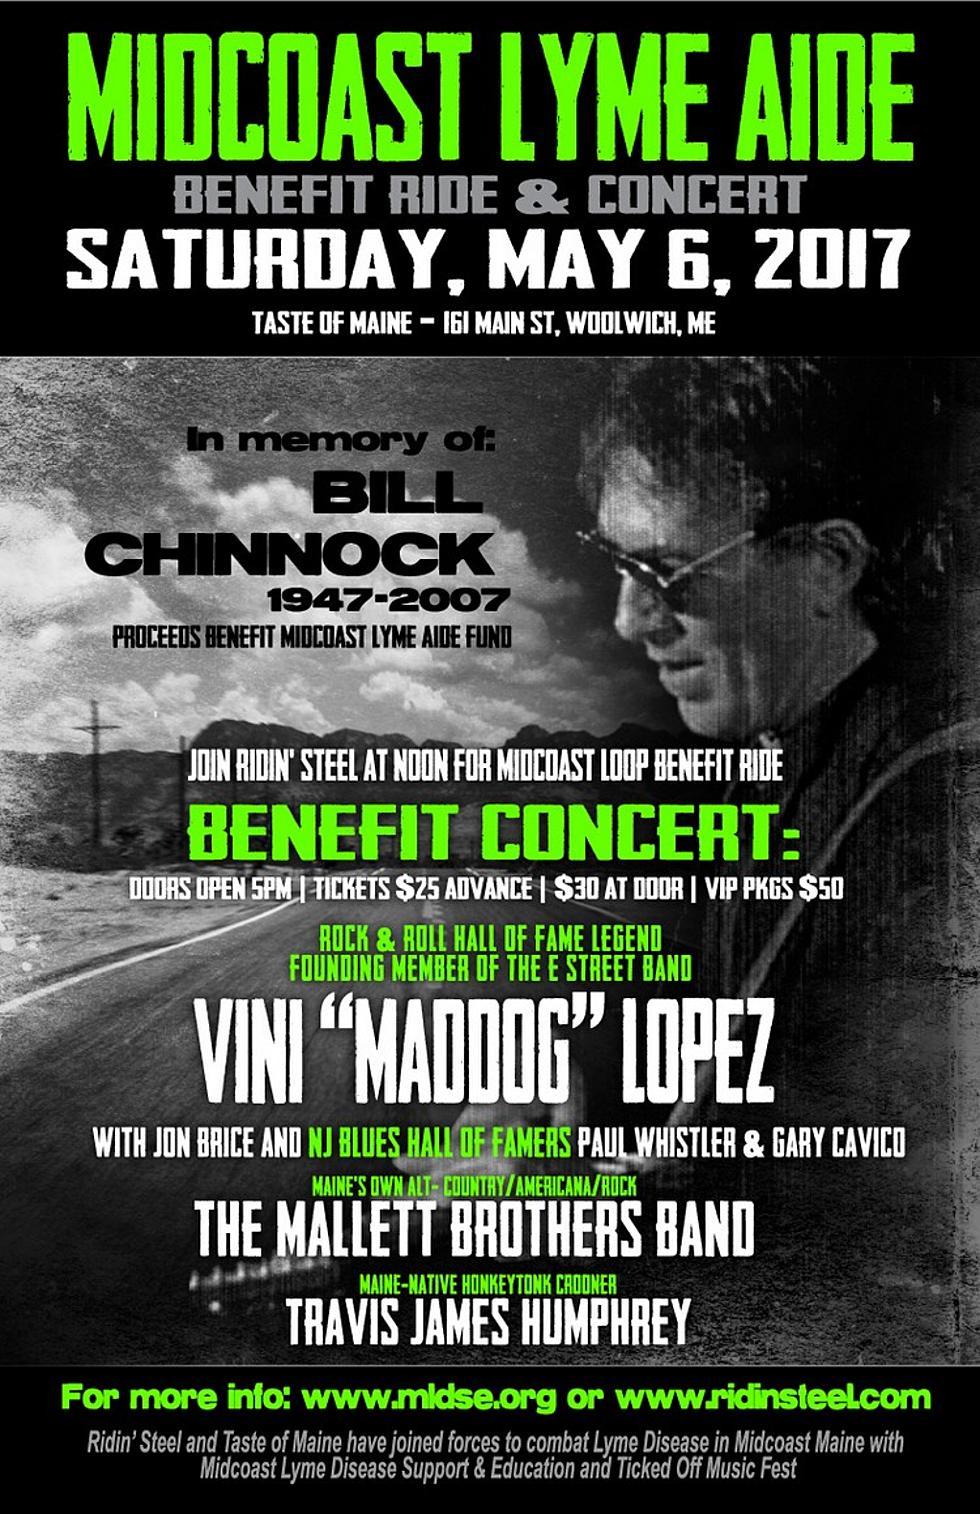 E Street Band Member Vini Mad Dog Lopez On Blimp Audio